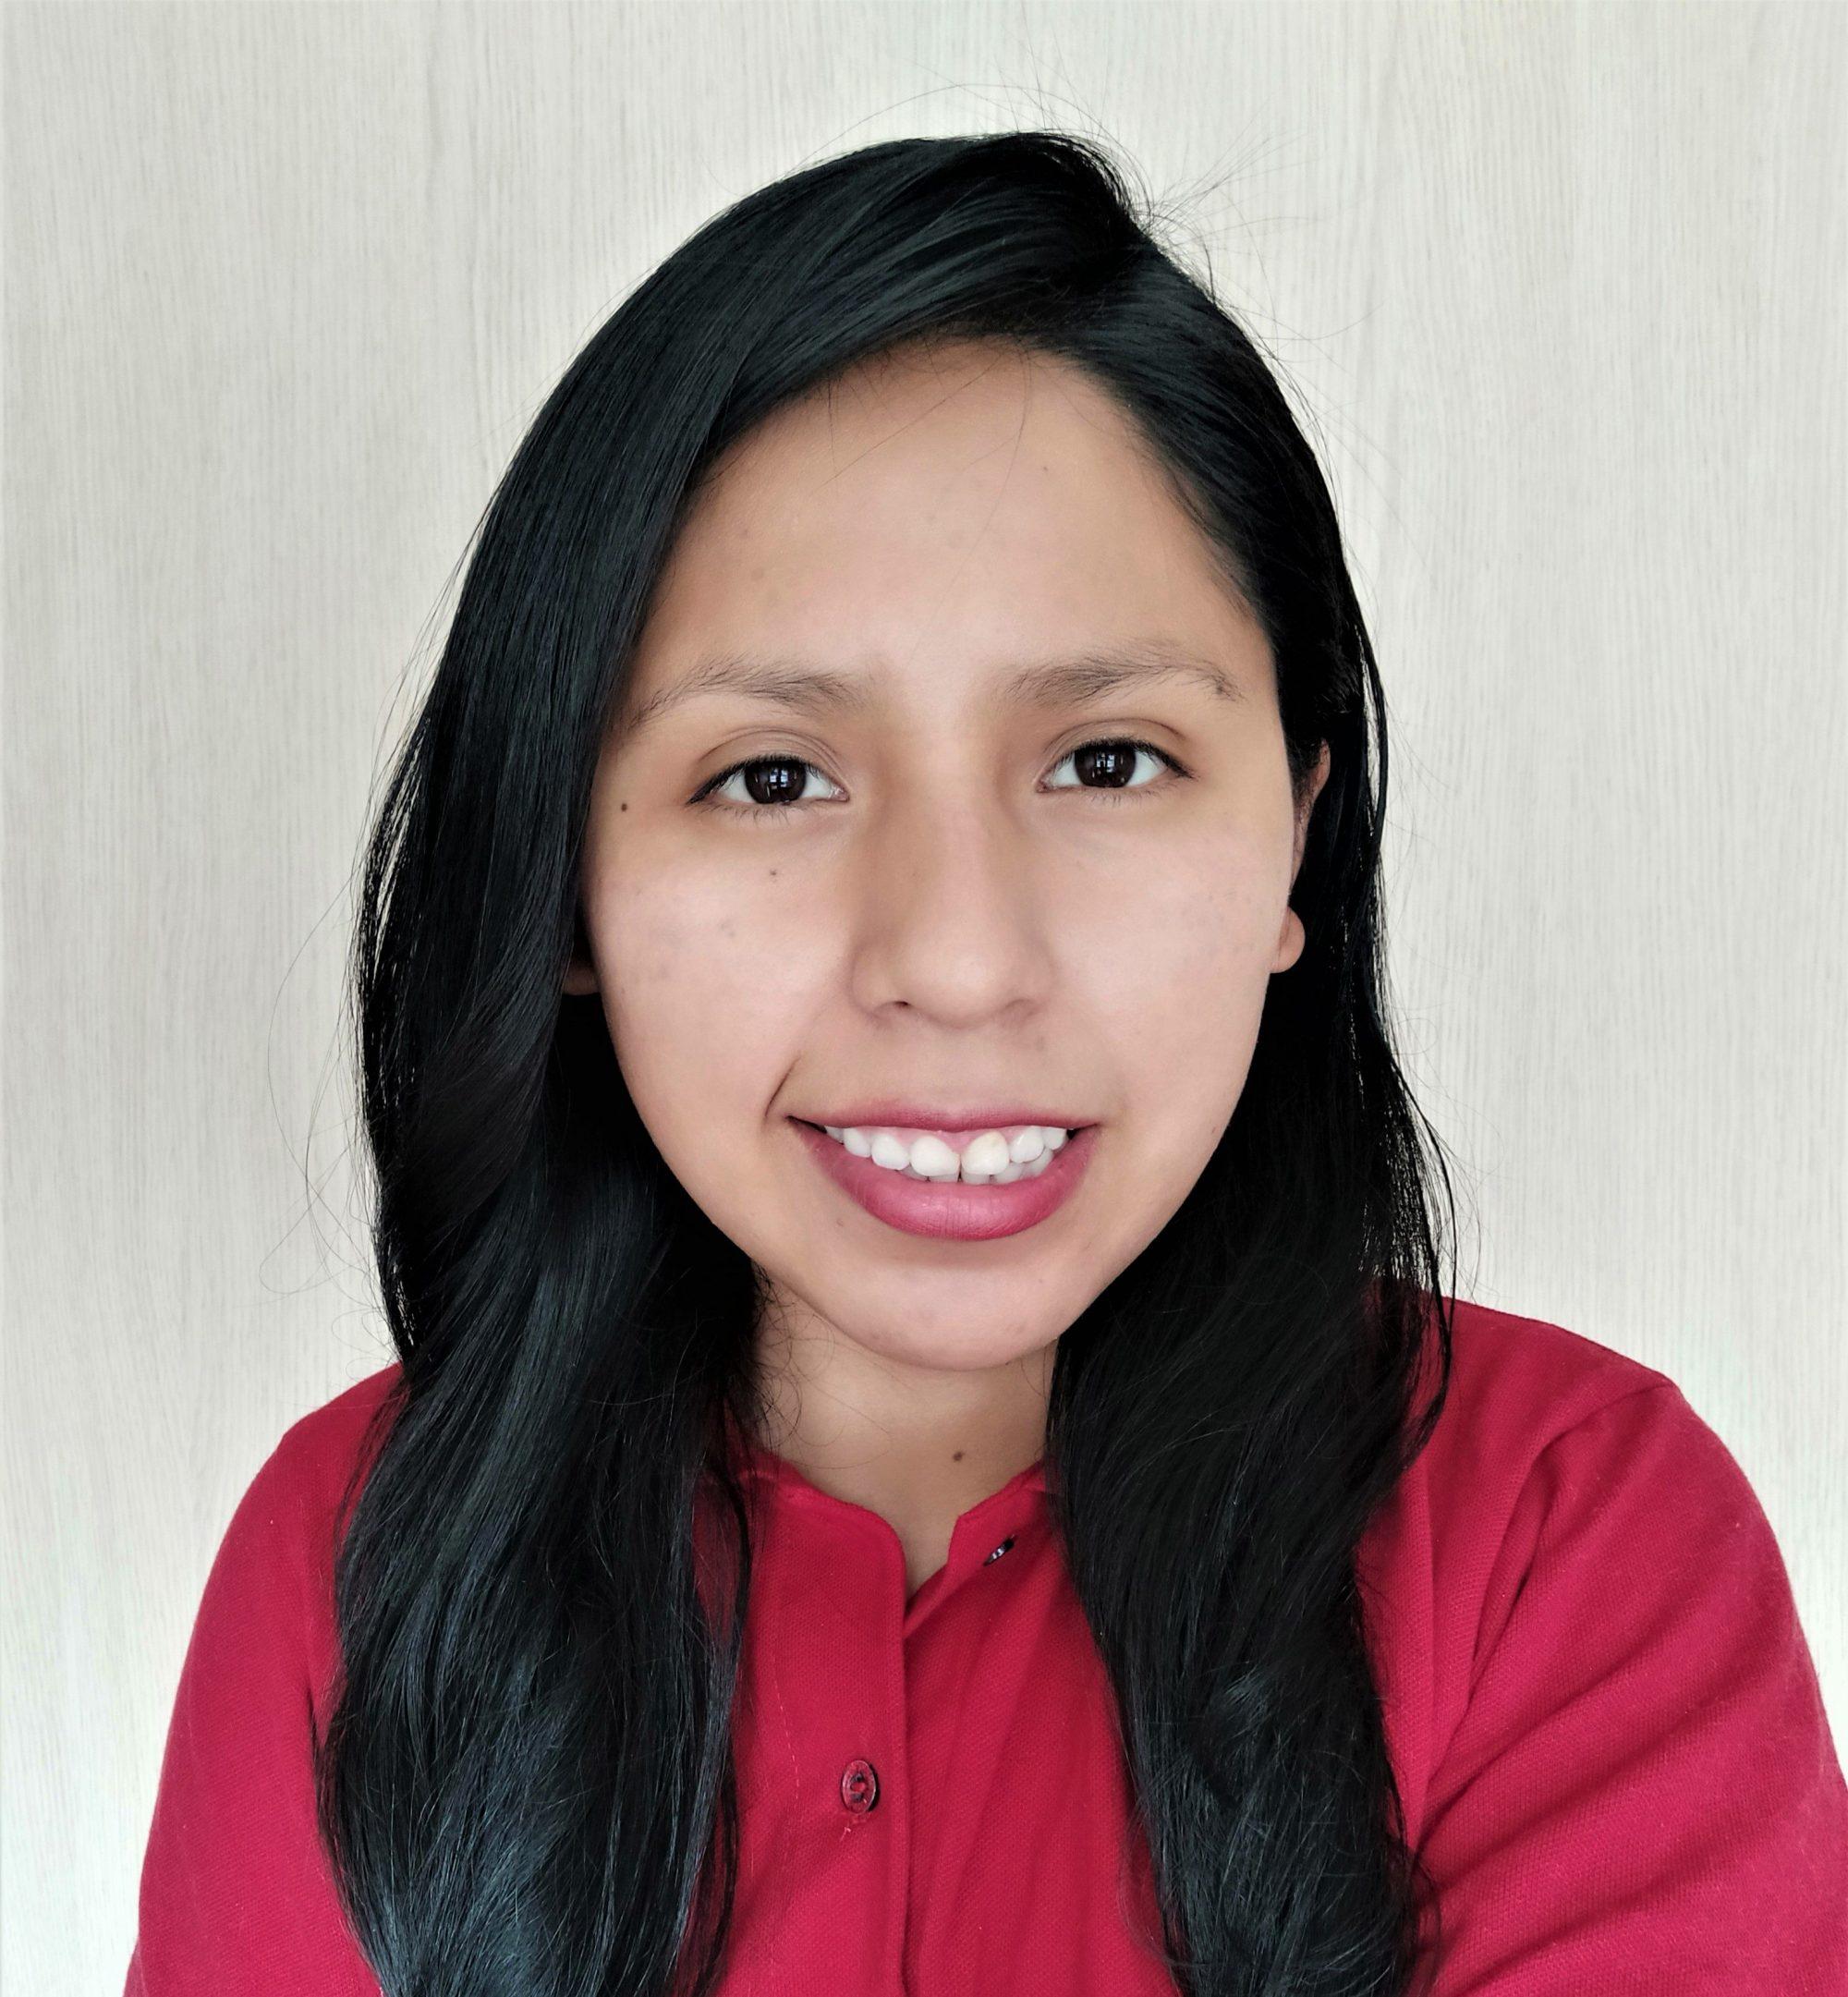 Headshot photograph of Kely Alejo